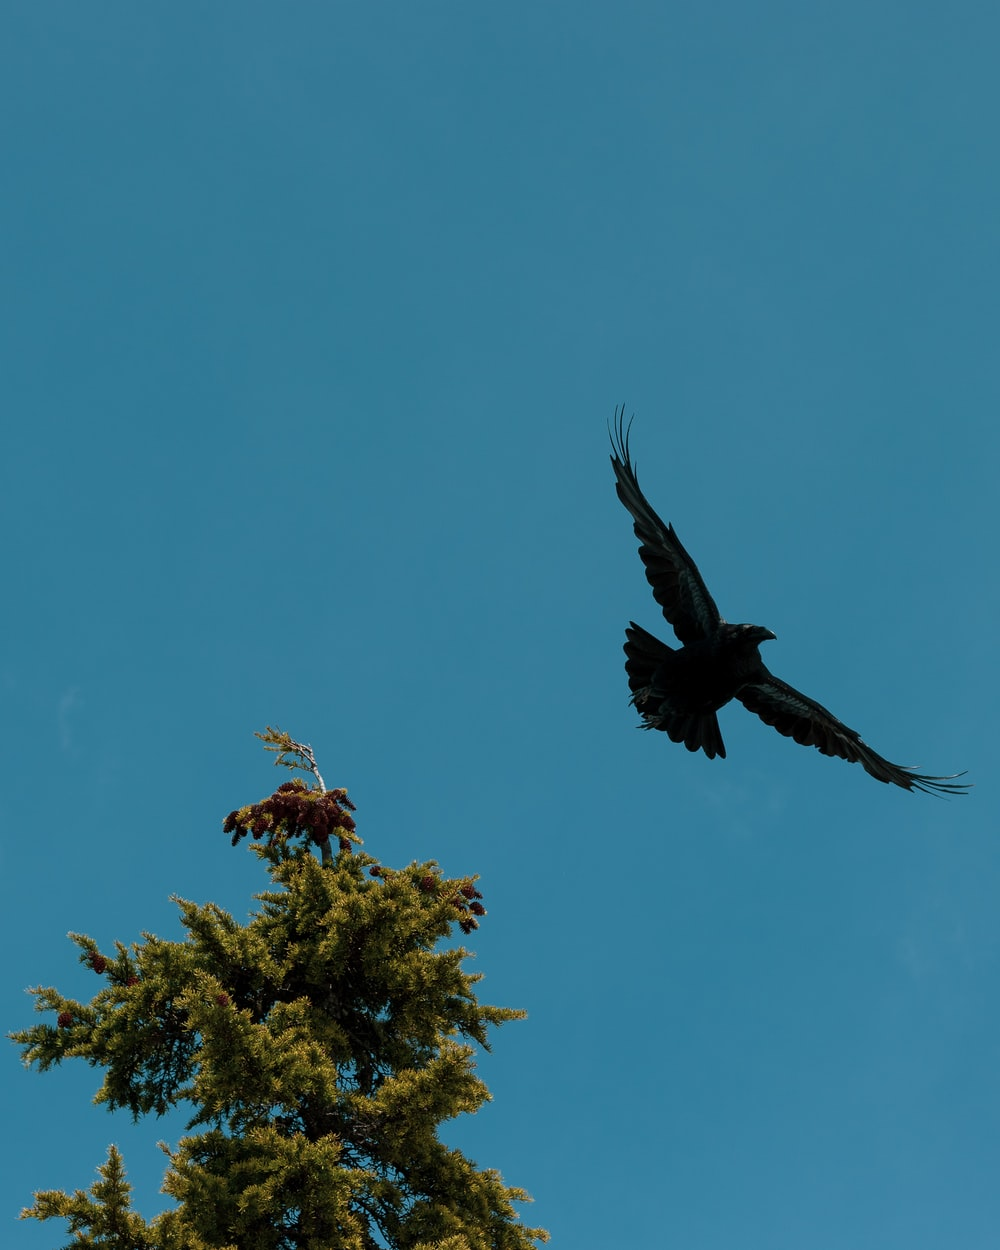 black eagle flying near tree